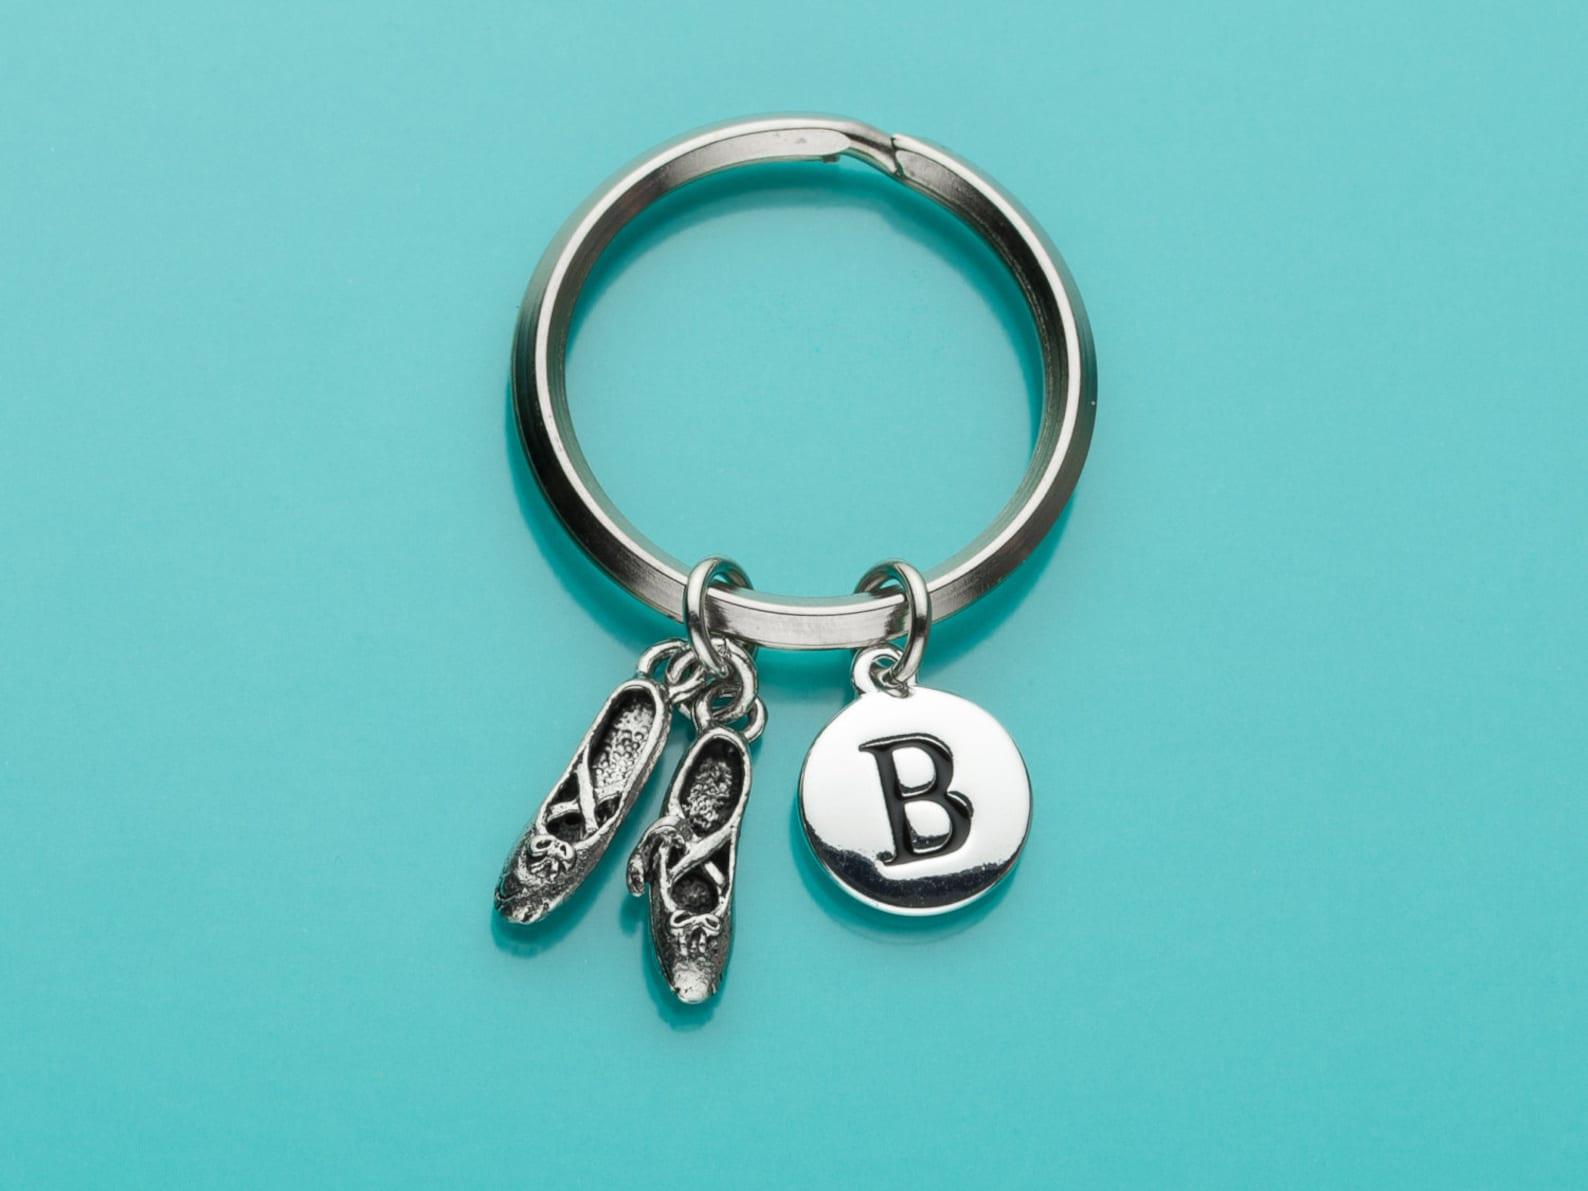 ballet slippers keychain, ballet slippers key ring, initial keychain, personalized keychain, custom keychain, charm keychain, 25